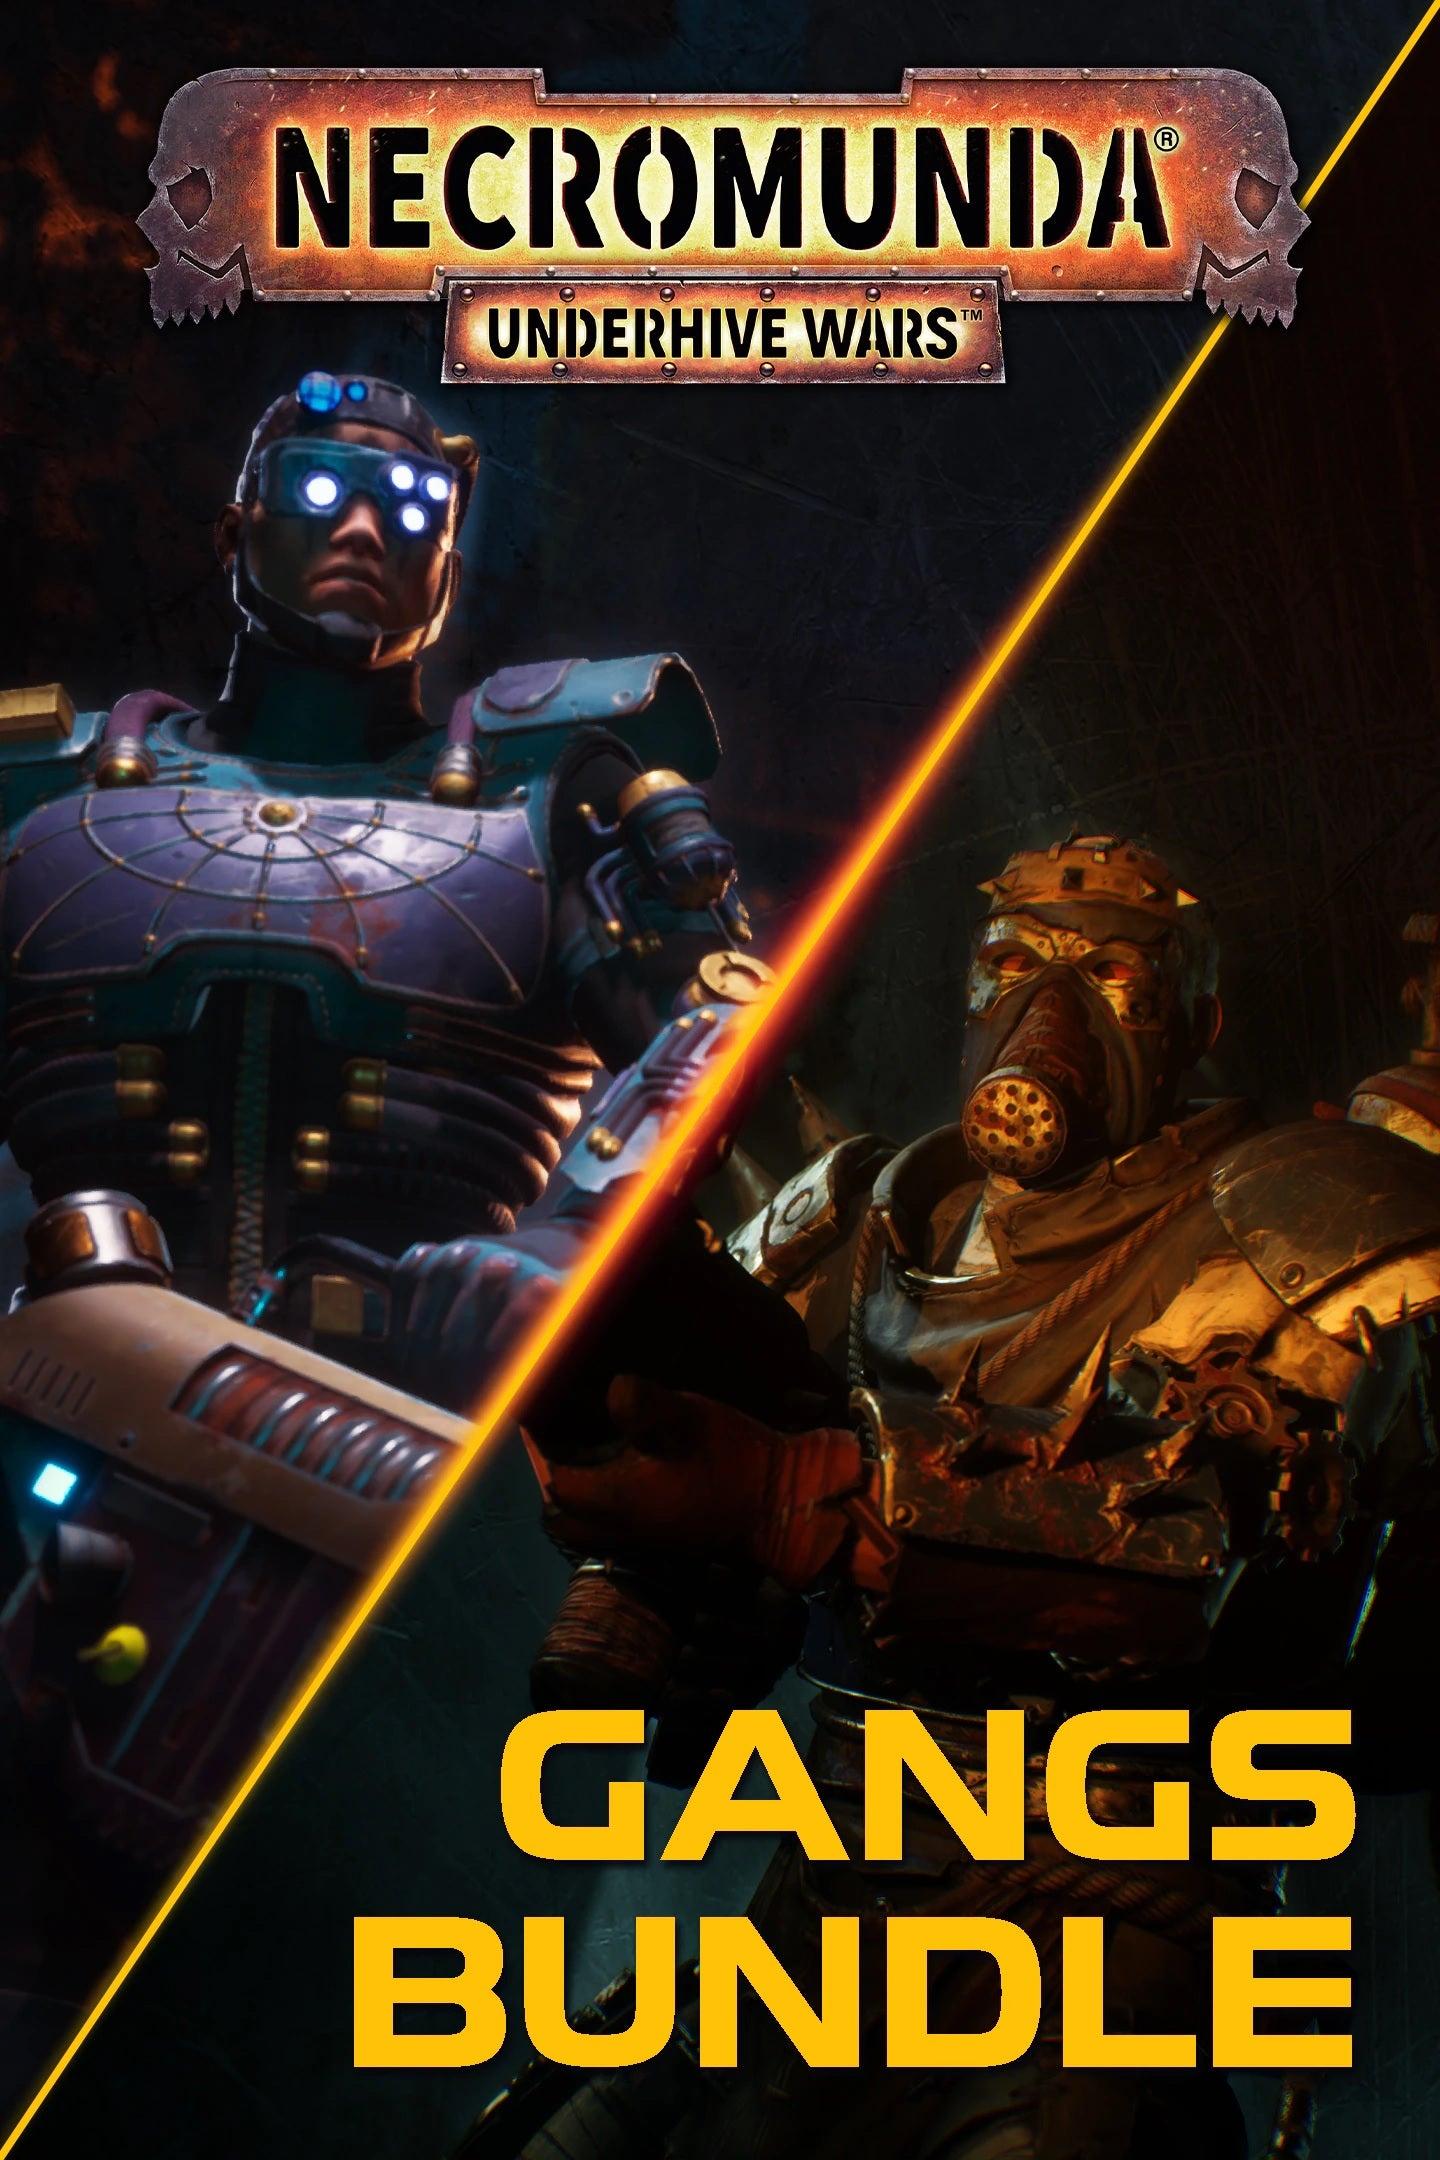 Focus Home Interactive Necromunda Underhive Wars Gangs Bundle PC Game